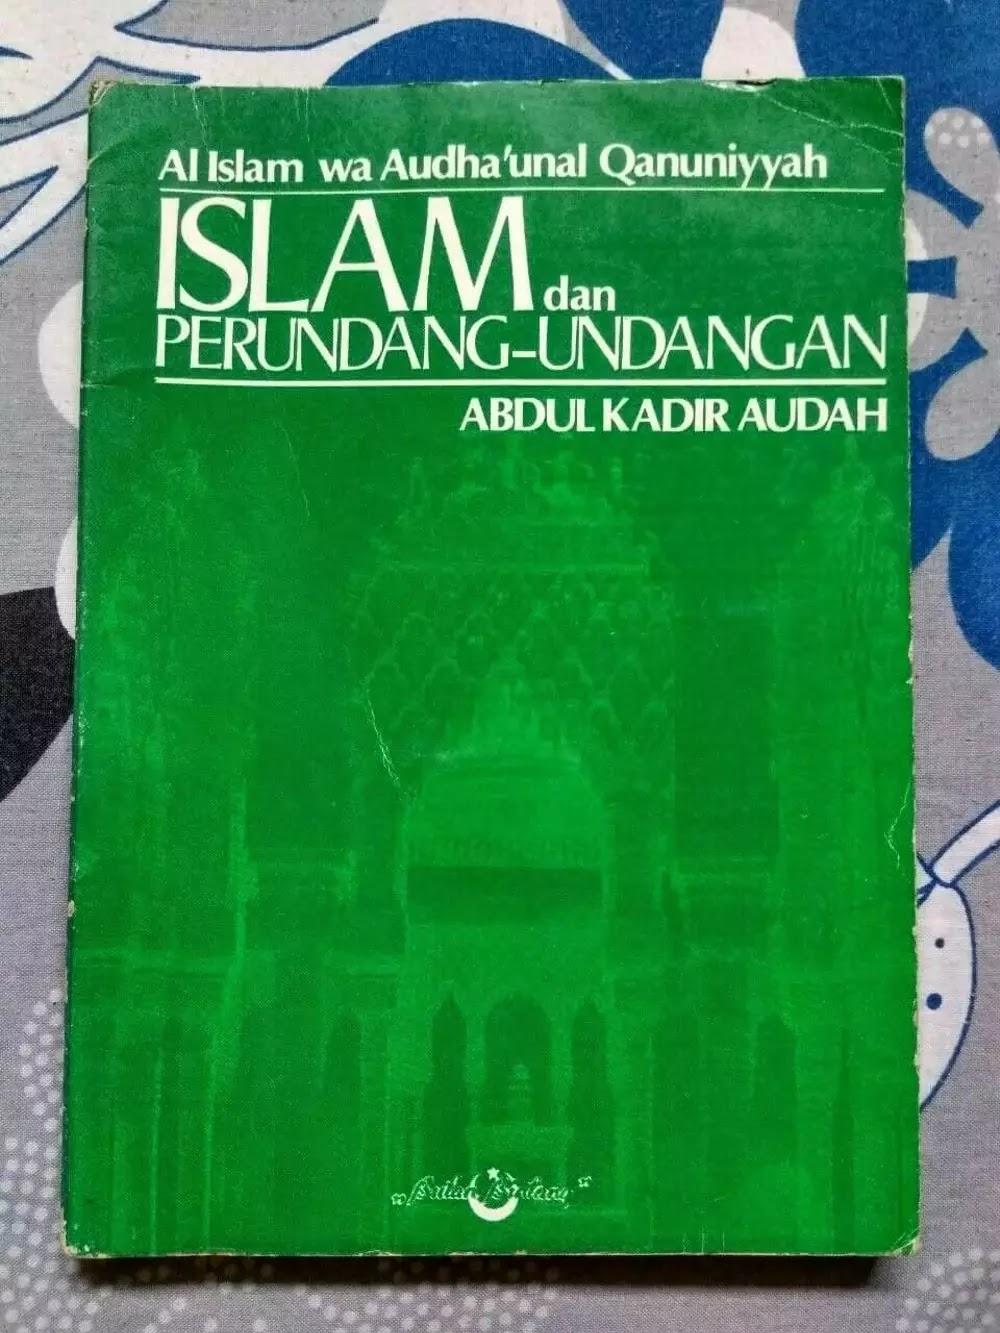 Ebook Muqaddimah Ibnu Khaldun